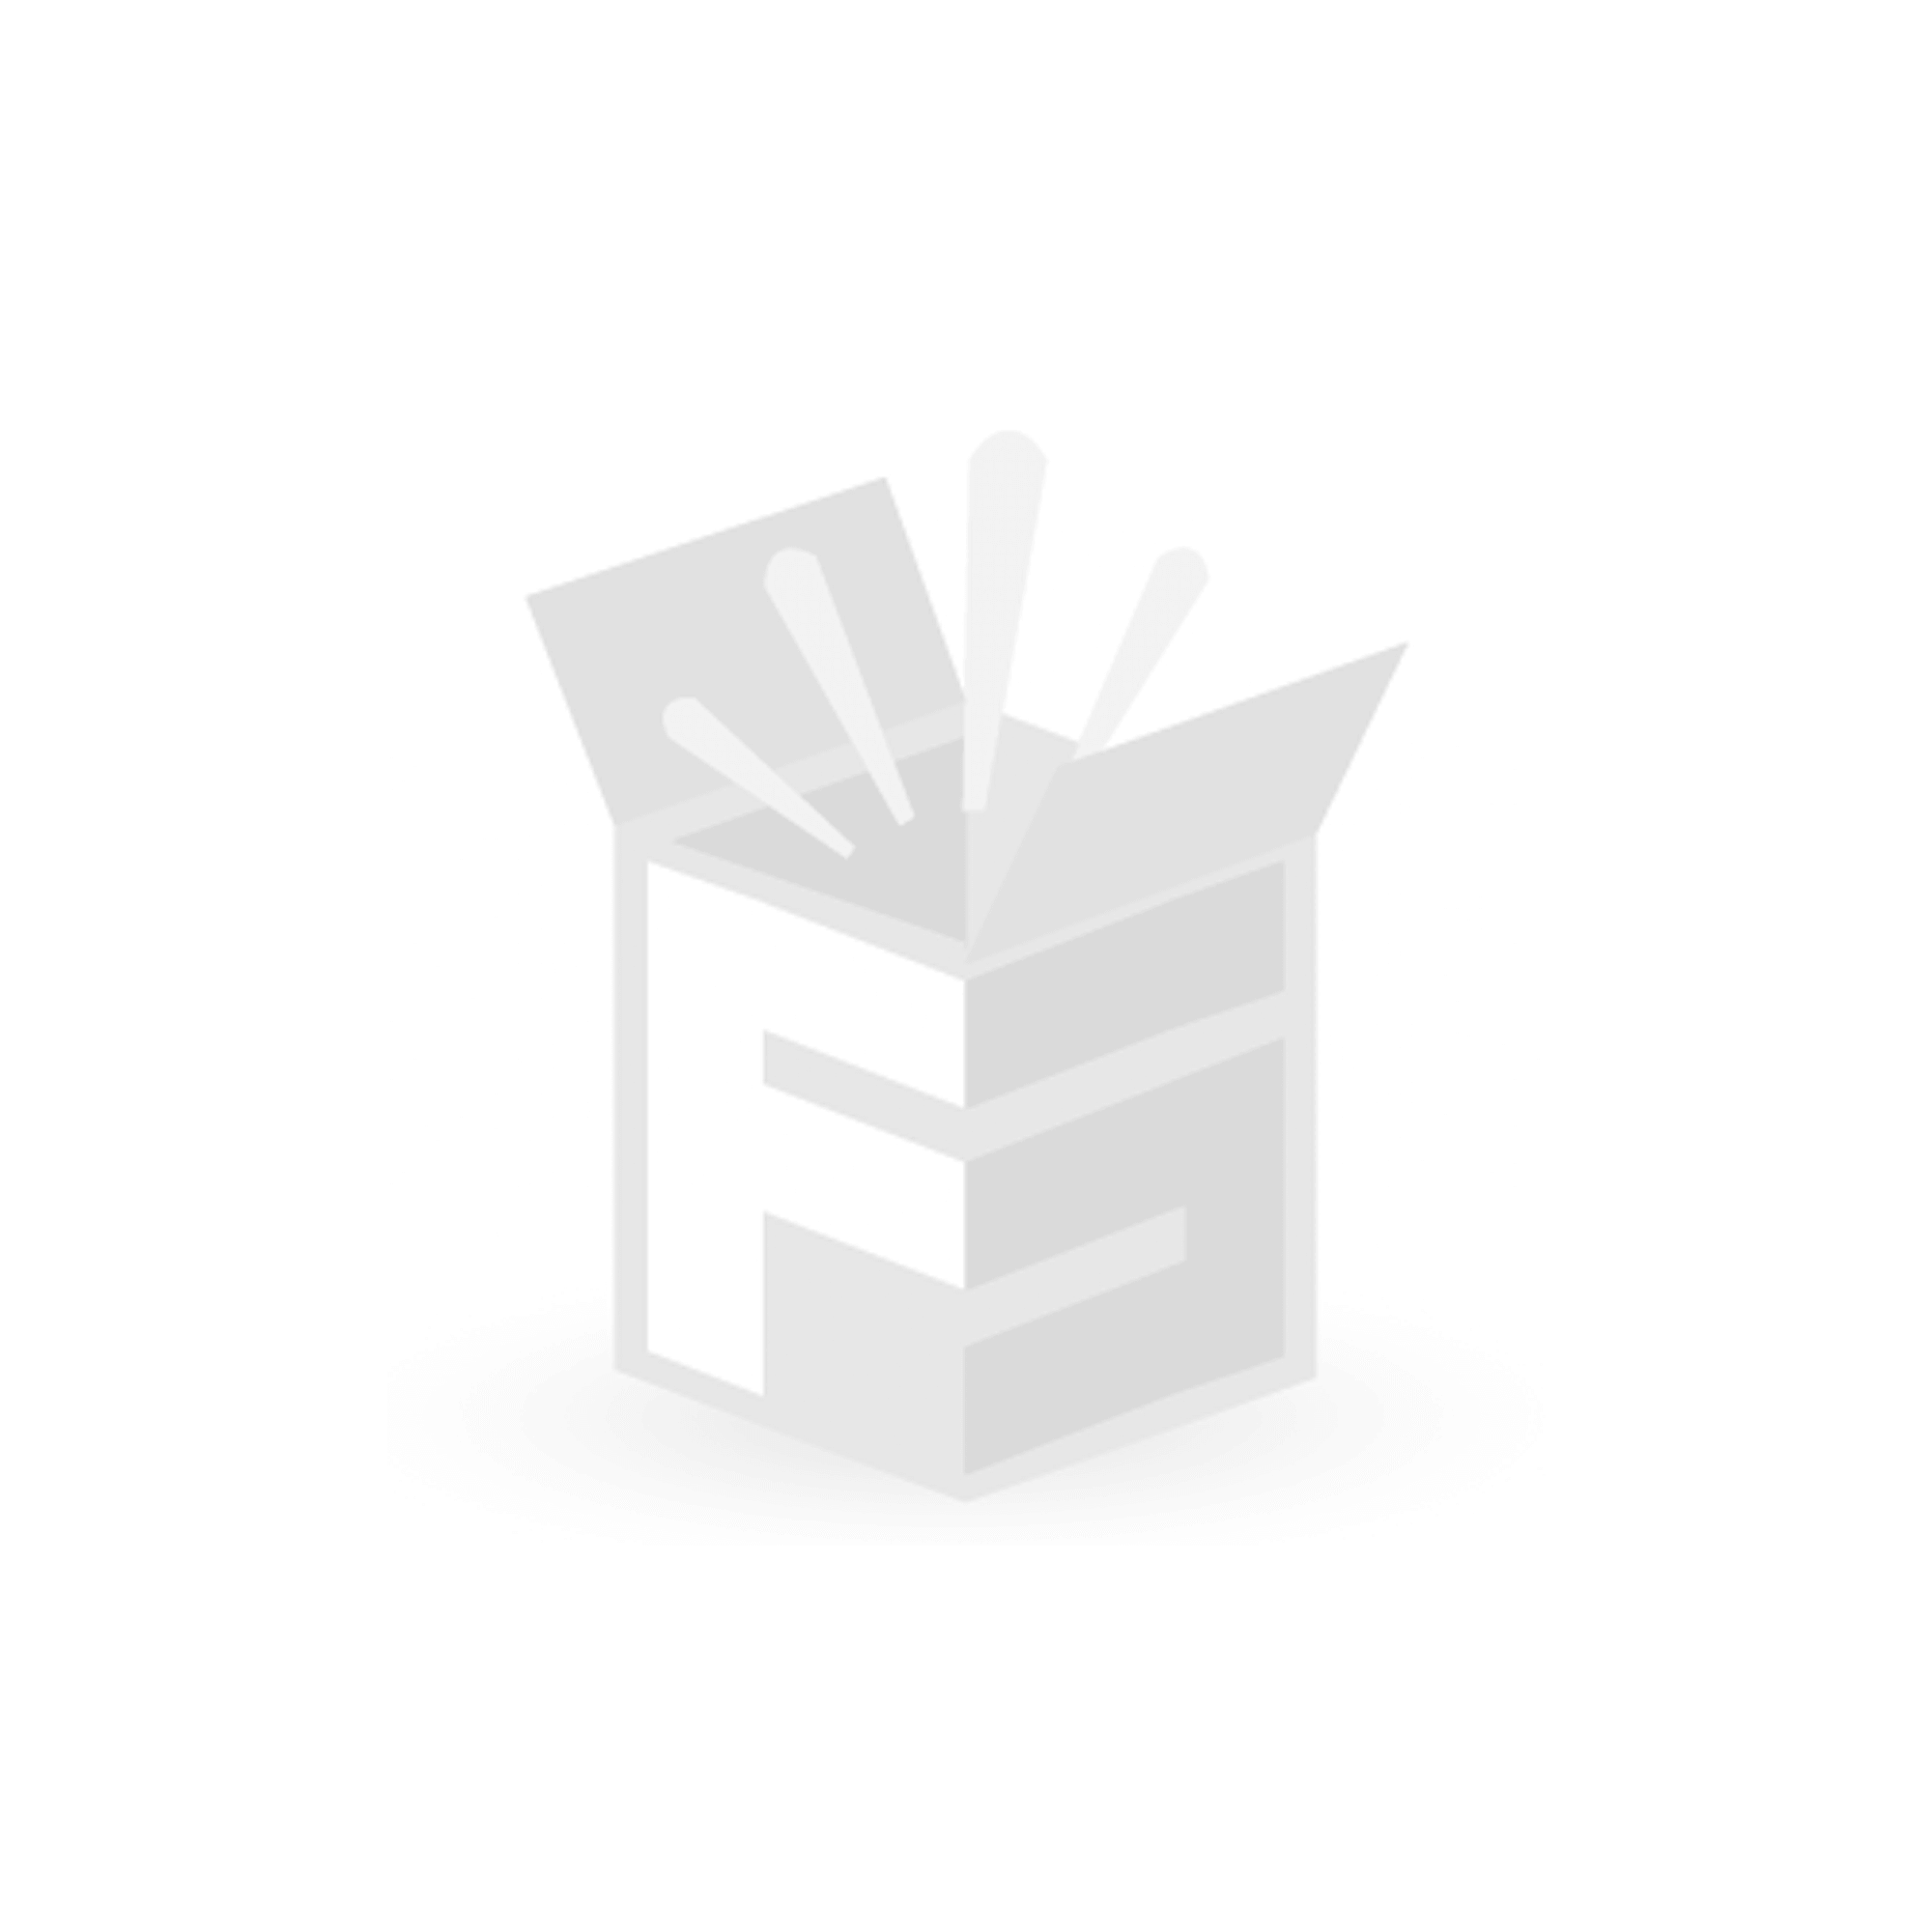 FS-STAR Rührschüssel-Set mit Deckel, 3-teilig